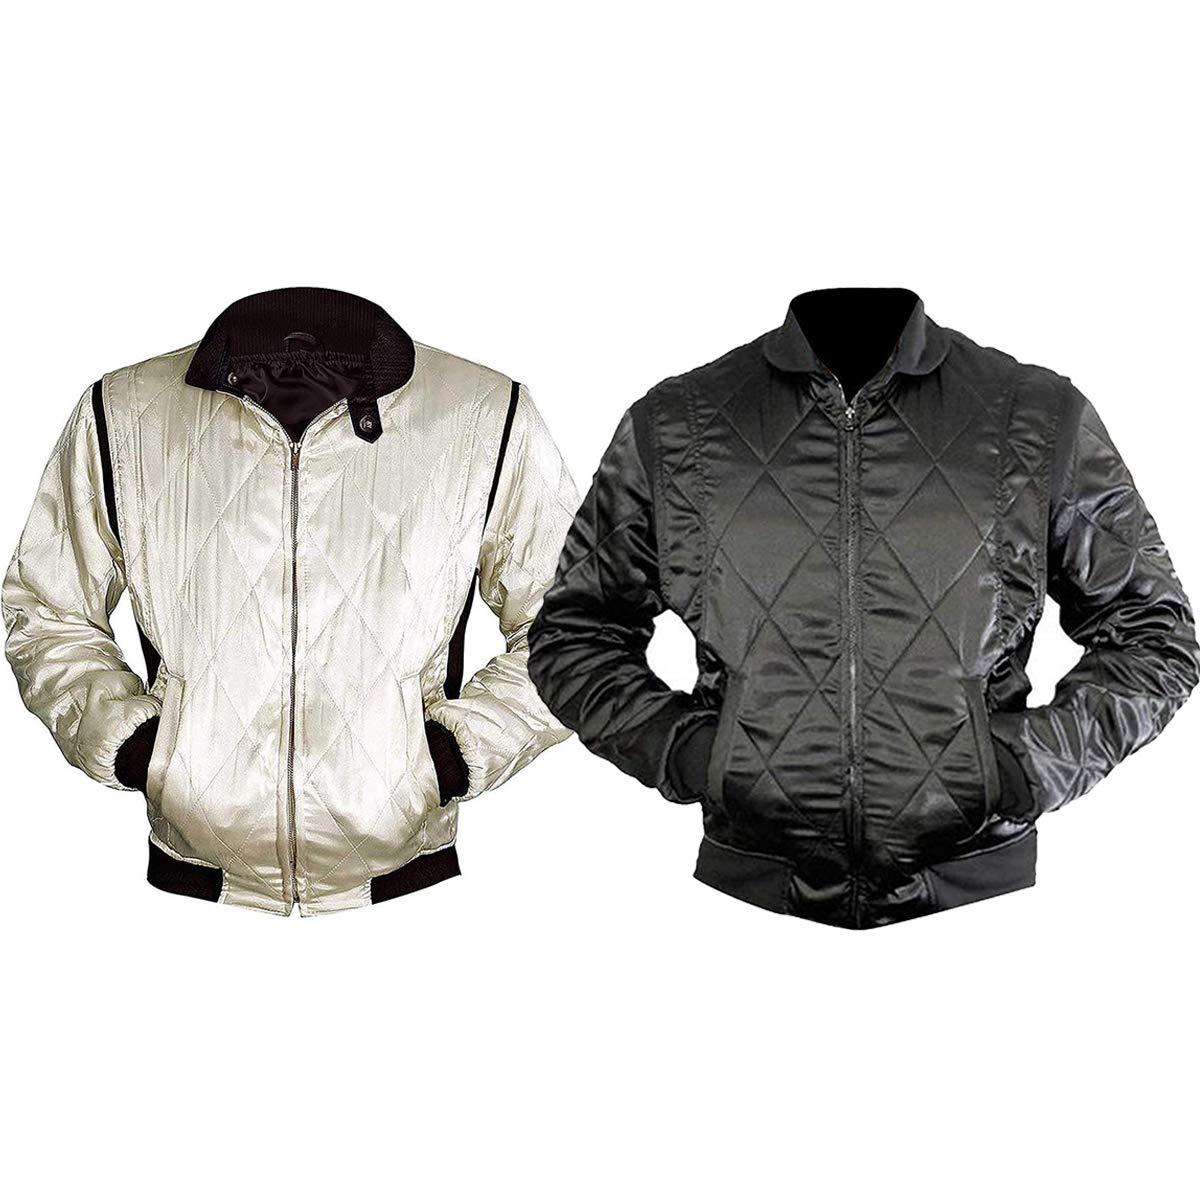 CHICAGO-FASHIONS Mens Motorcycle Ryan Driver Gosling Scorpio Logo Ivory White Bomber Satin Jacket by CHICAGO-FASHIONS